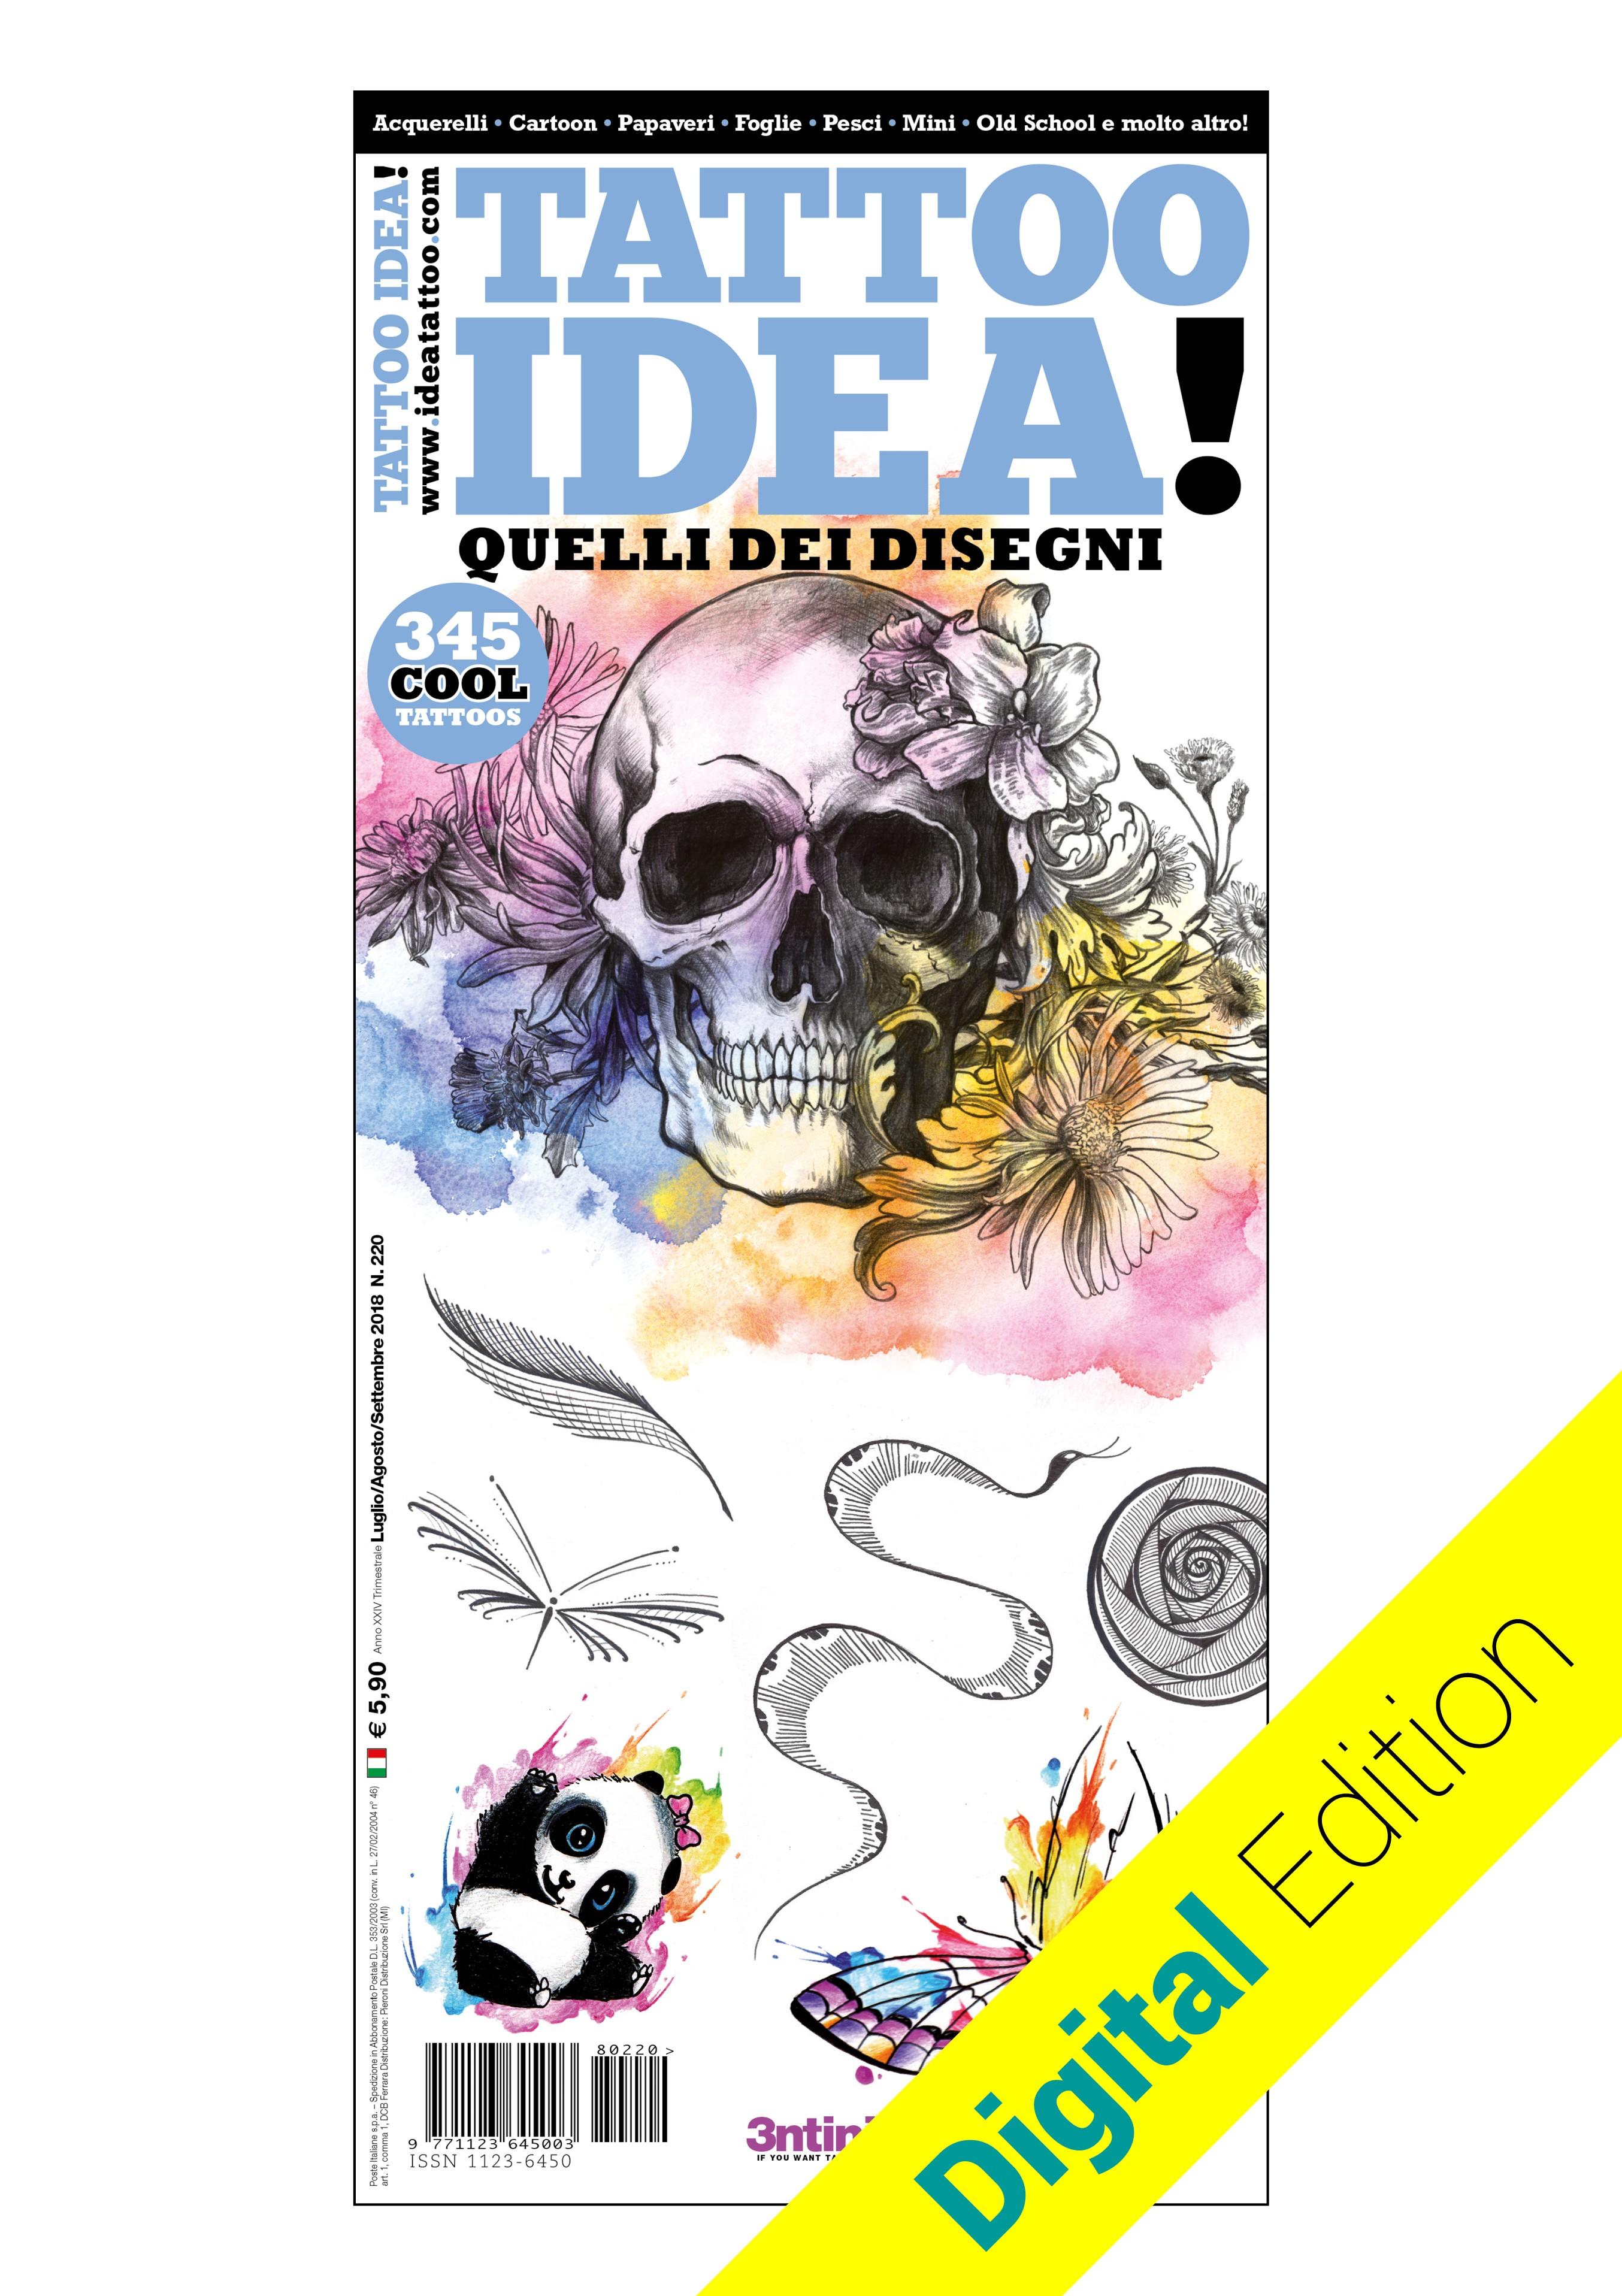 Idea Tattoo 220 July/August/September 2018 [digital edition]